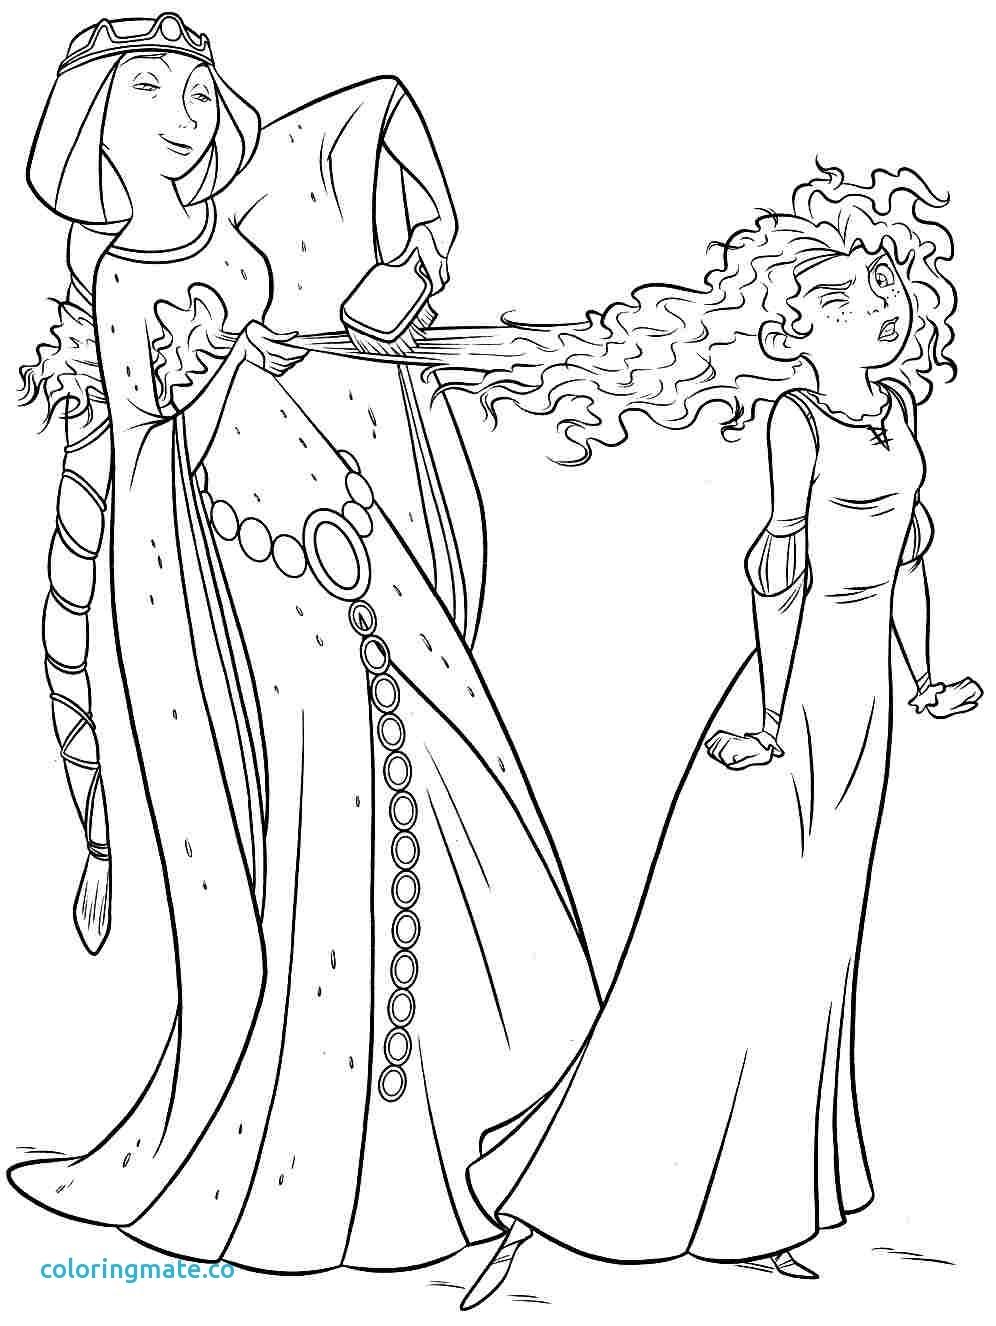 996x1326 Fresh Coloring Pages Of Disney Princess Merida Design Printable